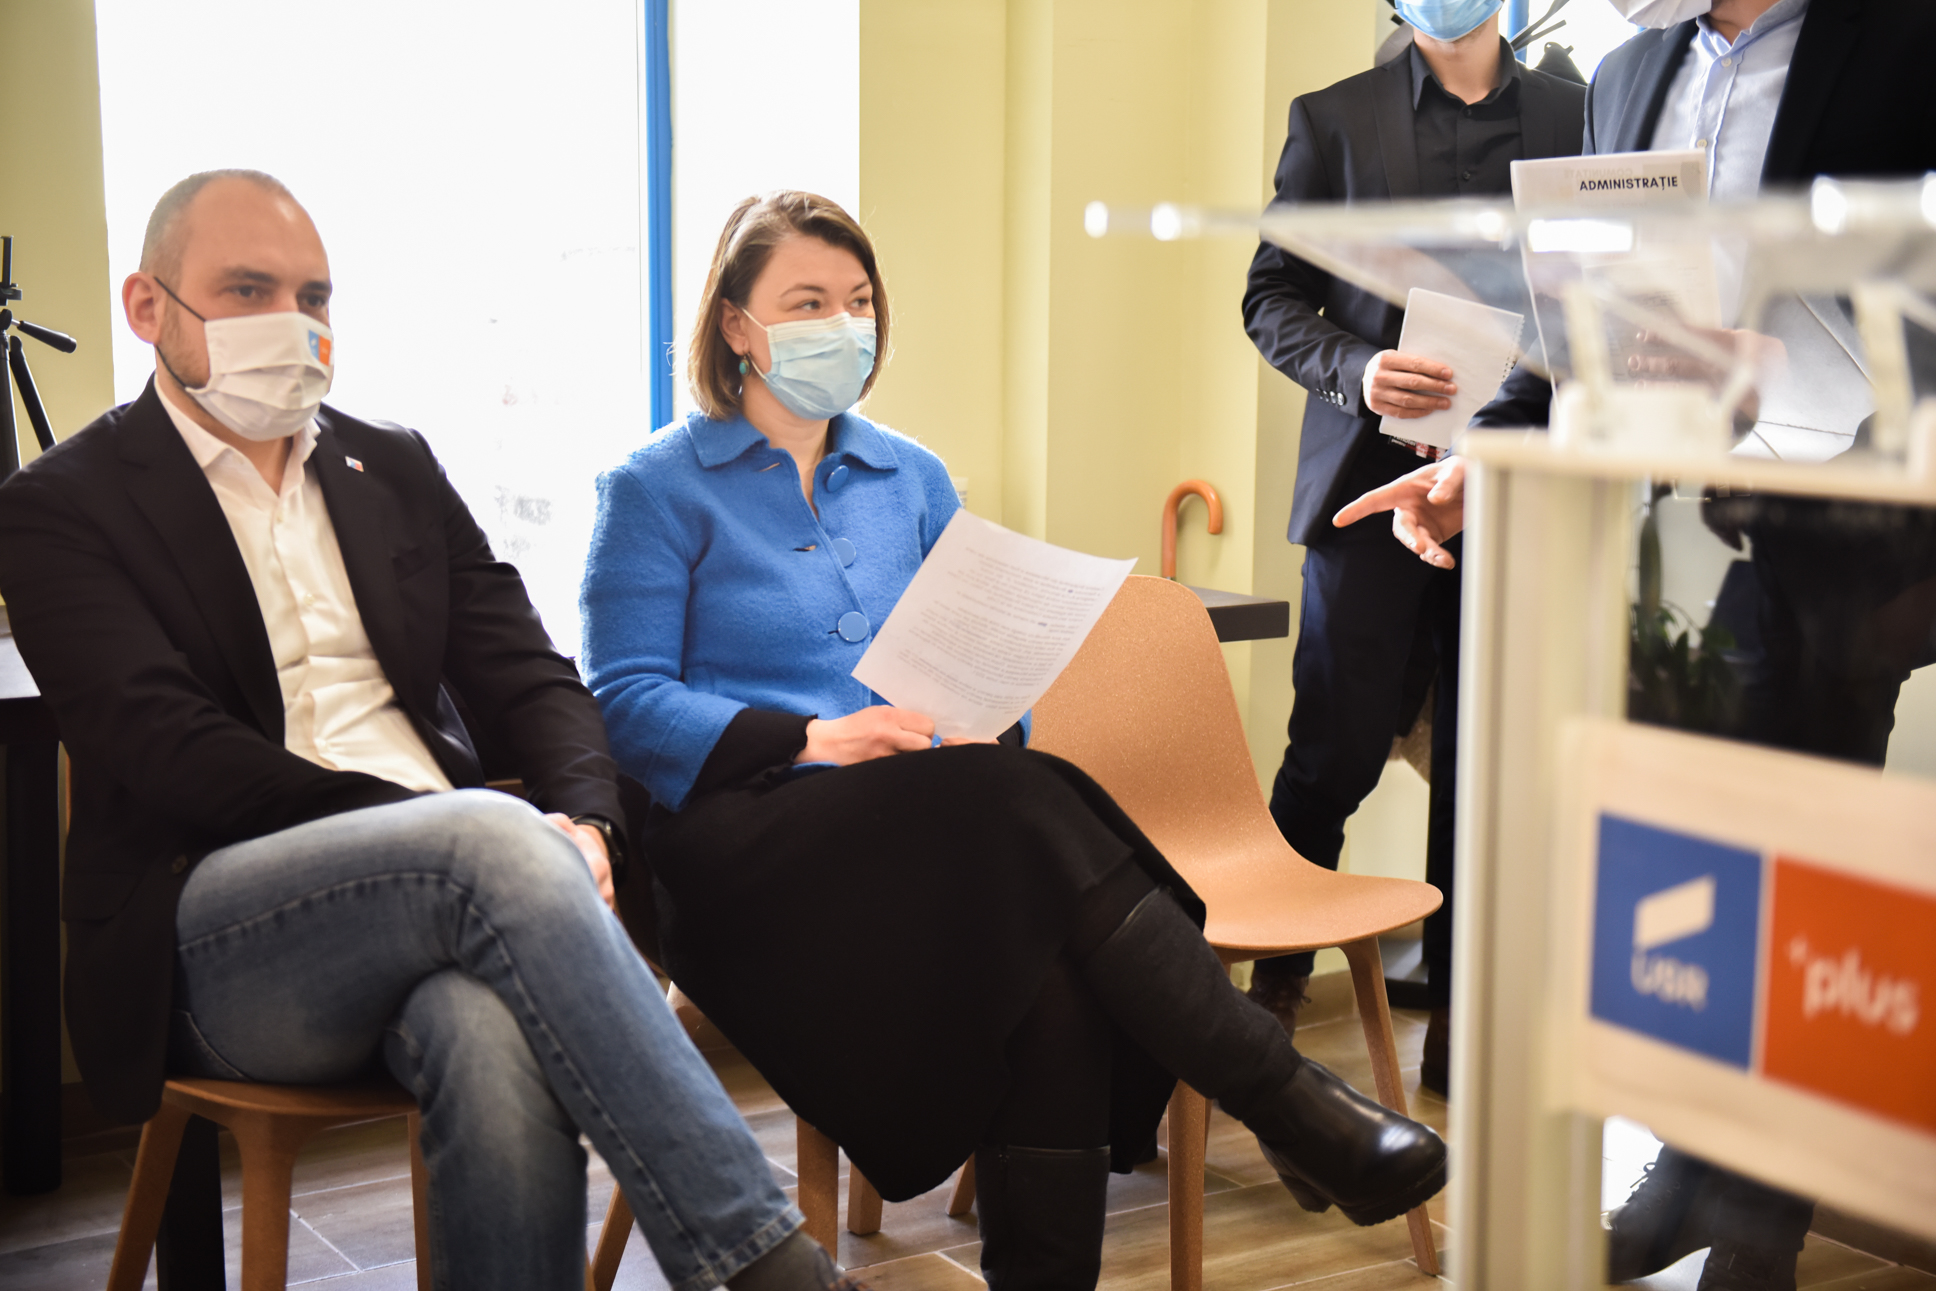 Ruxandra Cibu sau Adrian Echert? Noii politicieni din USR PLUS Sibiu își aleg primul președinte